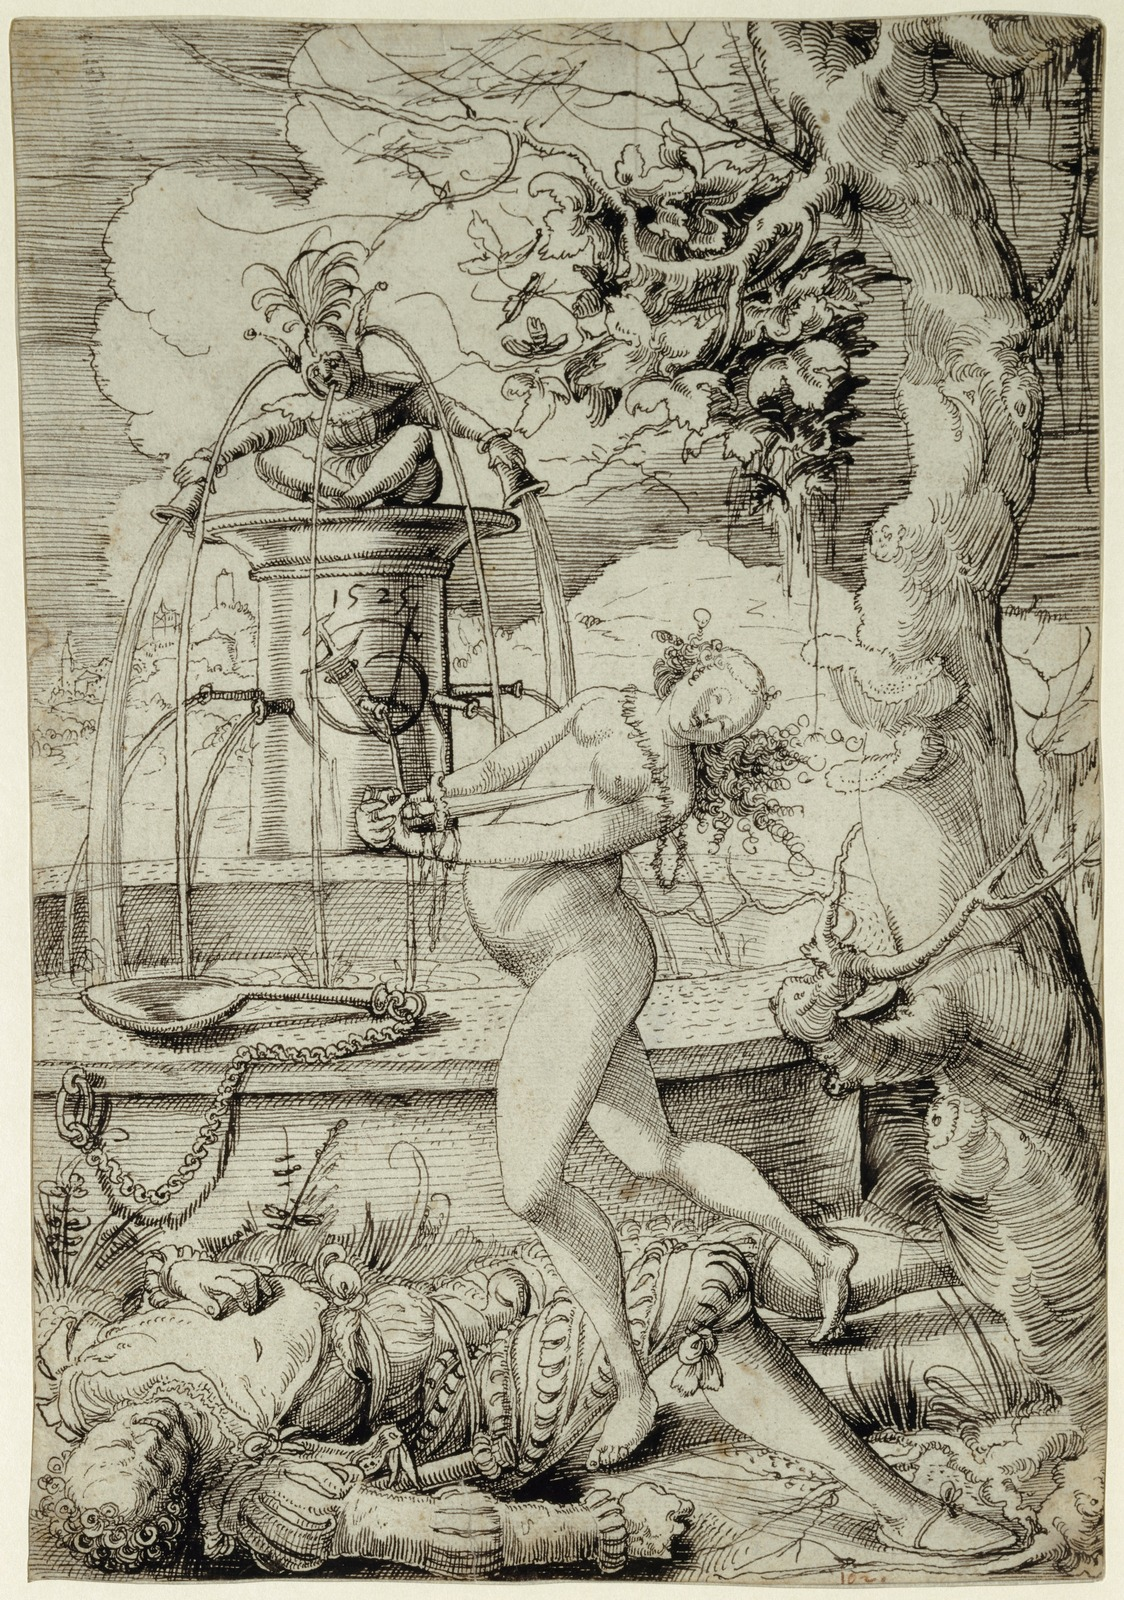 Пирам и Фисба (Pyramus und Thisbe)_1525_29.2 х 20.3_бумага, перо черным тоном_Базель, Кунстмузеум.jpg